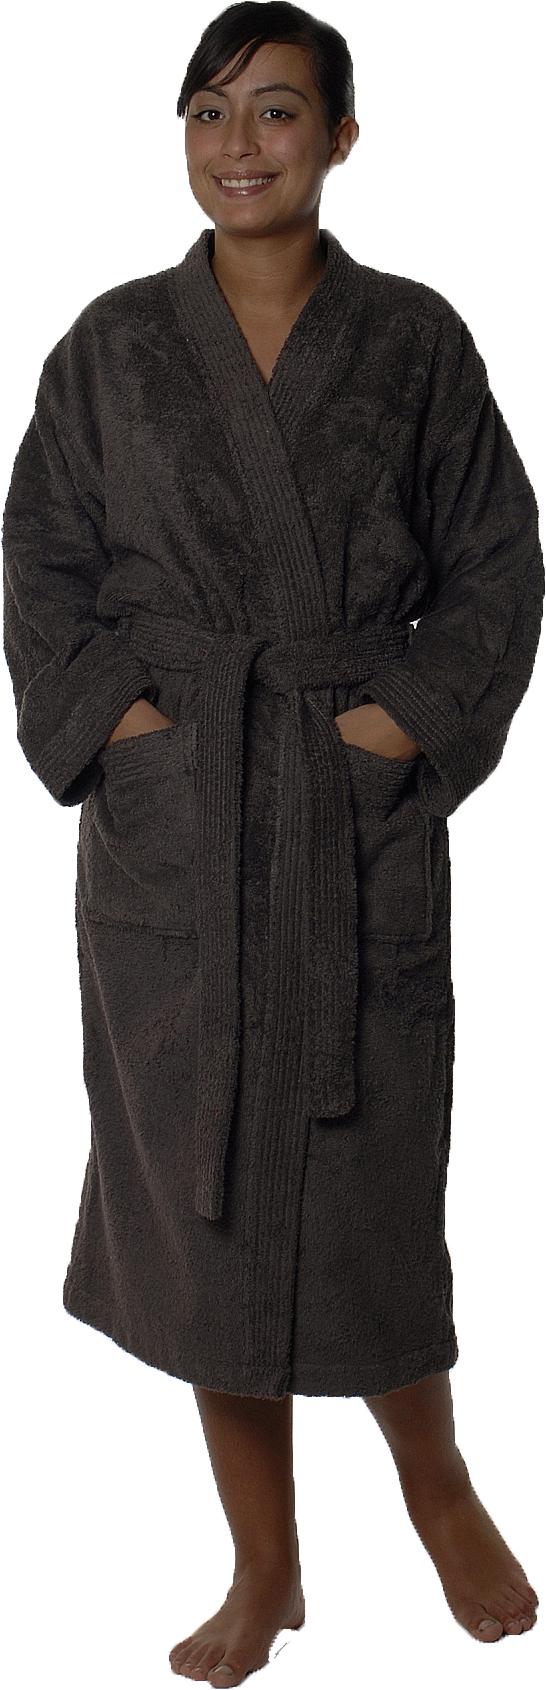 Peignoir col kimono en Coton couleur Vison Taille XXL